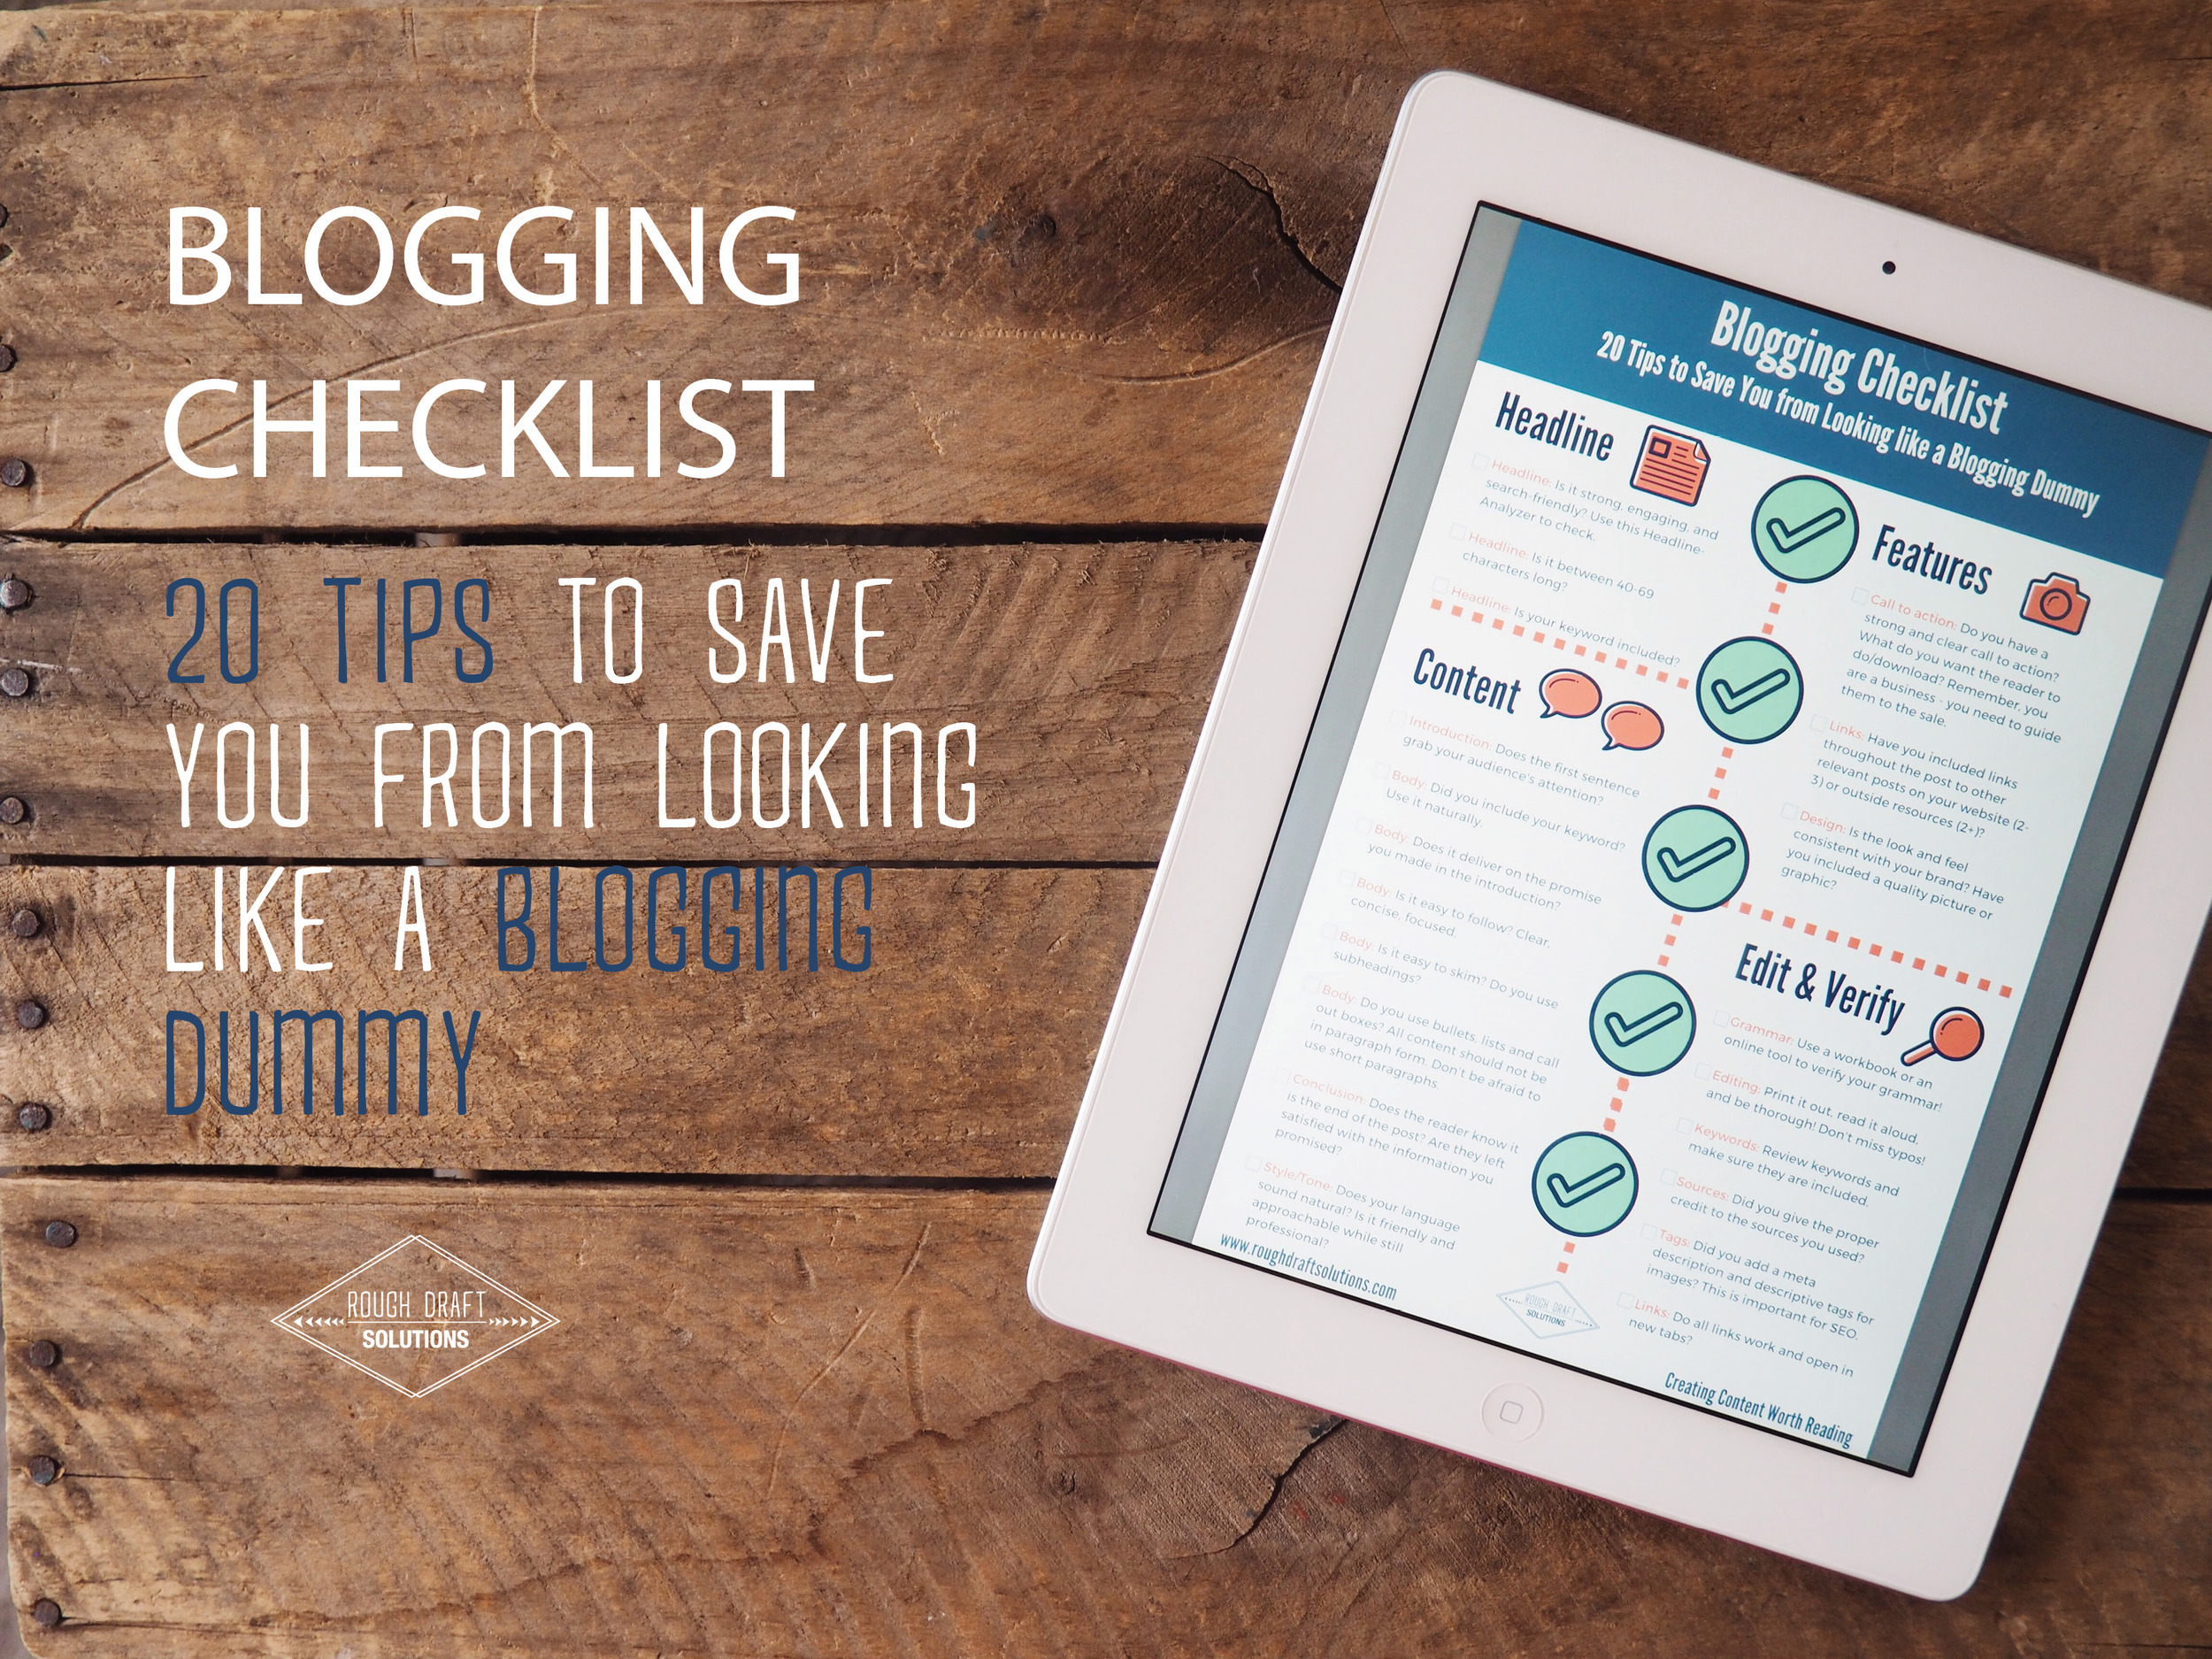 Blogging Checklist Tips